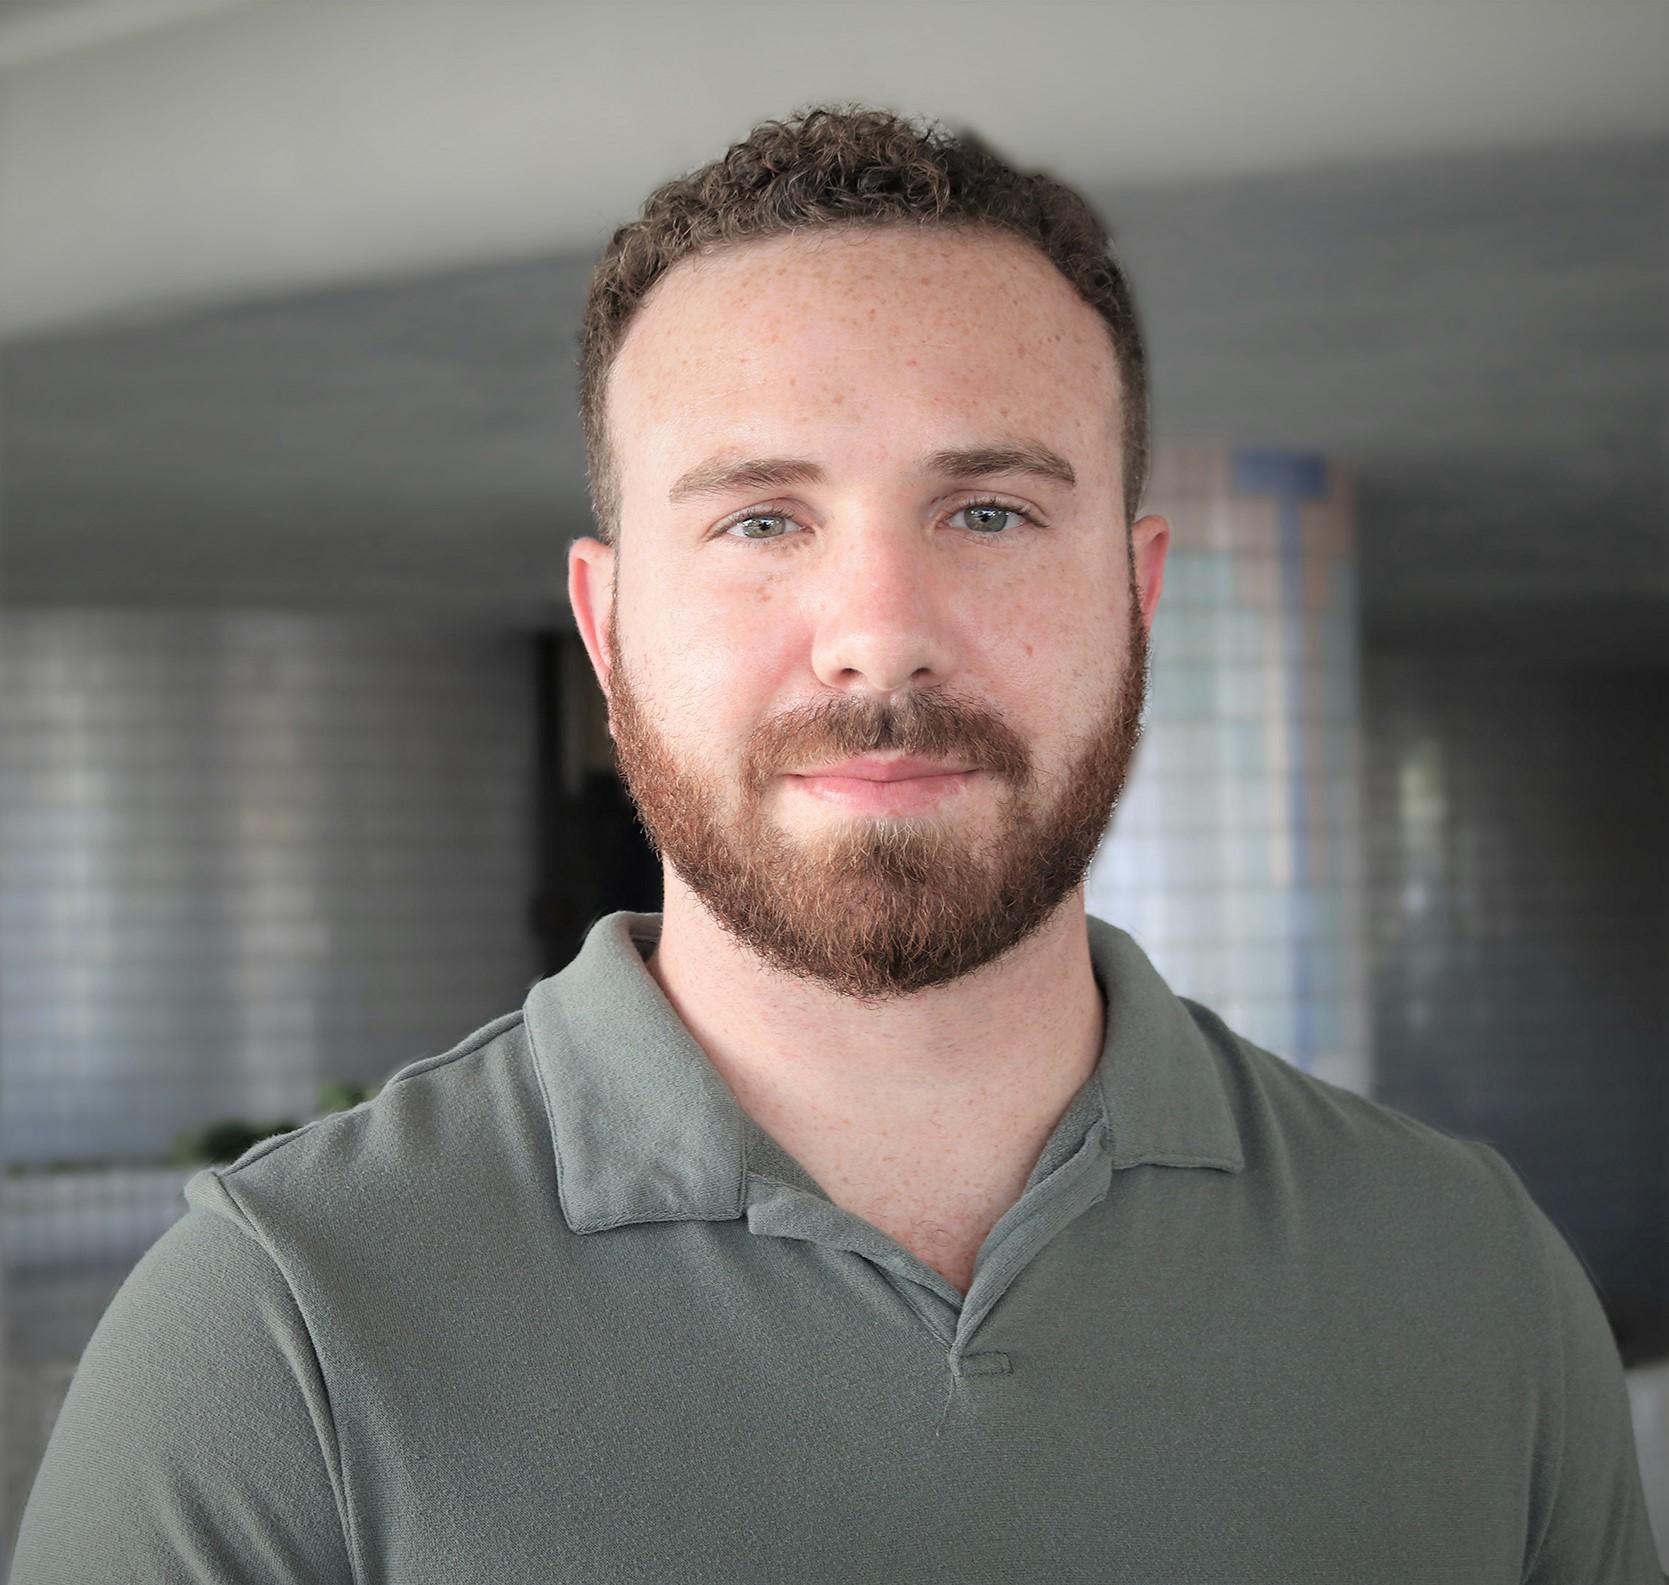 Joshua Deitchman